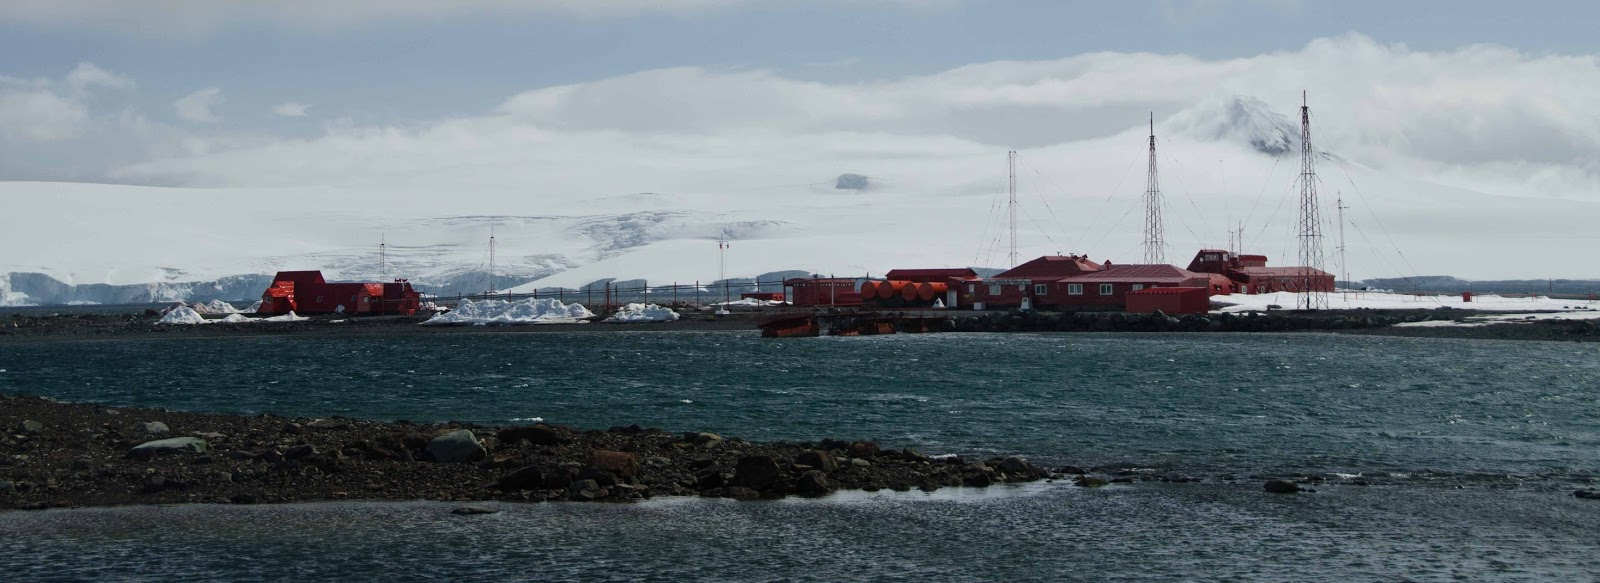 Bildresultat för armada de chile antarctica base prat